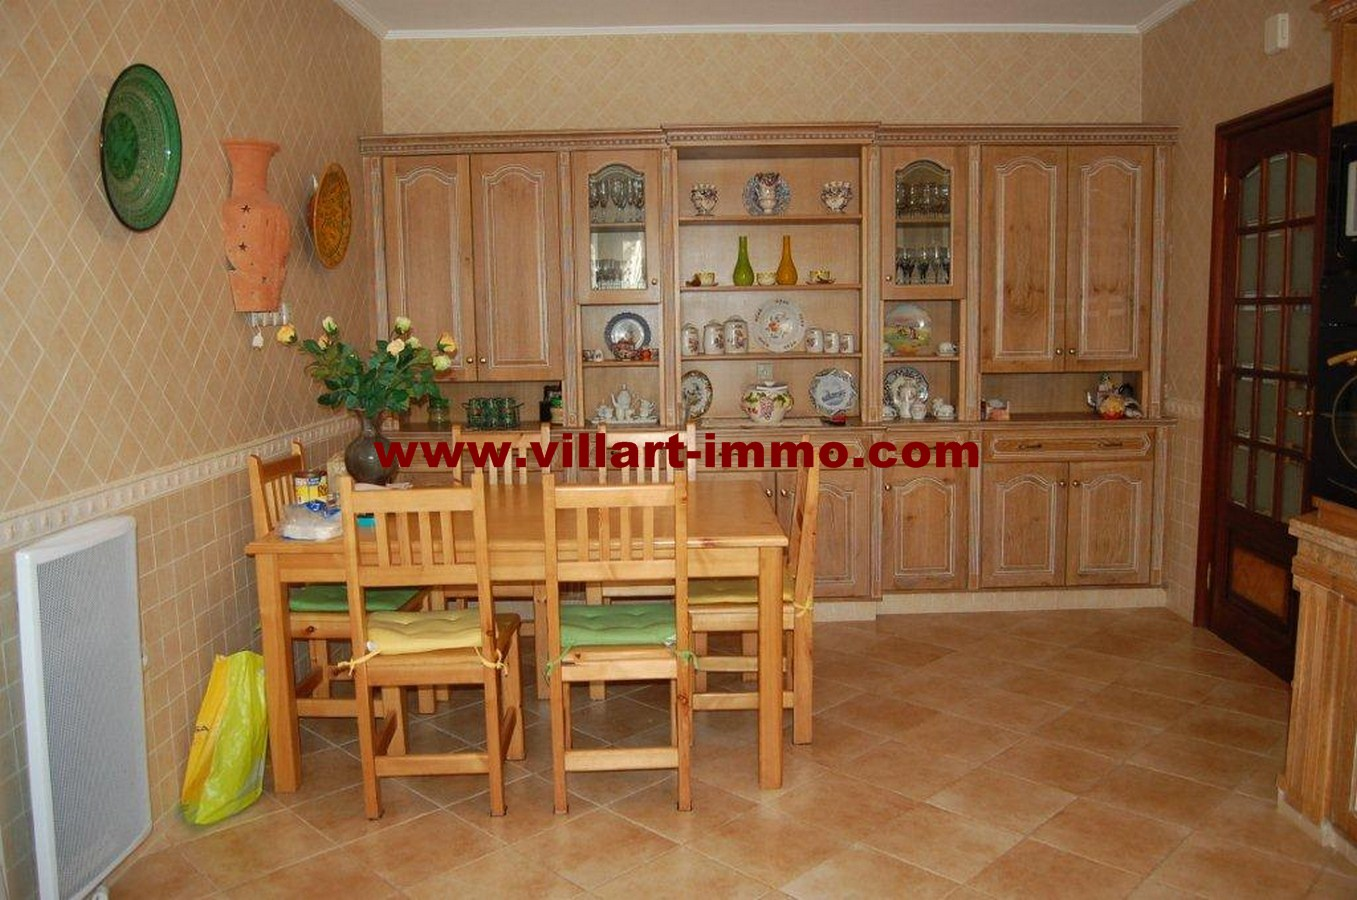 15-vente-appartement-tanger-la-montagne-salle-cuisine-2-va452-villart-immo